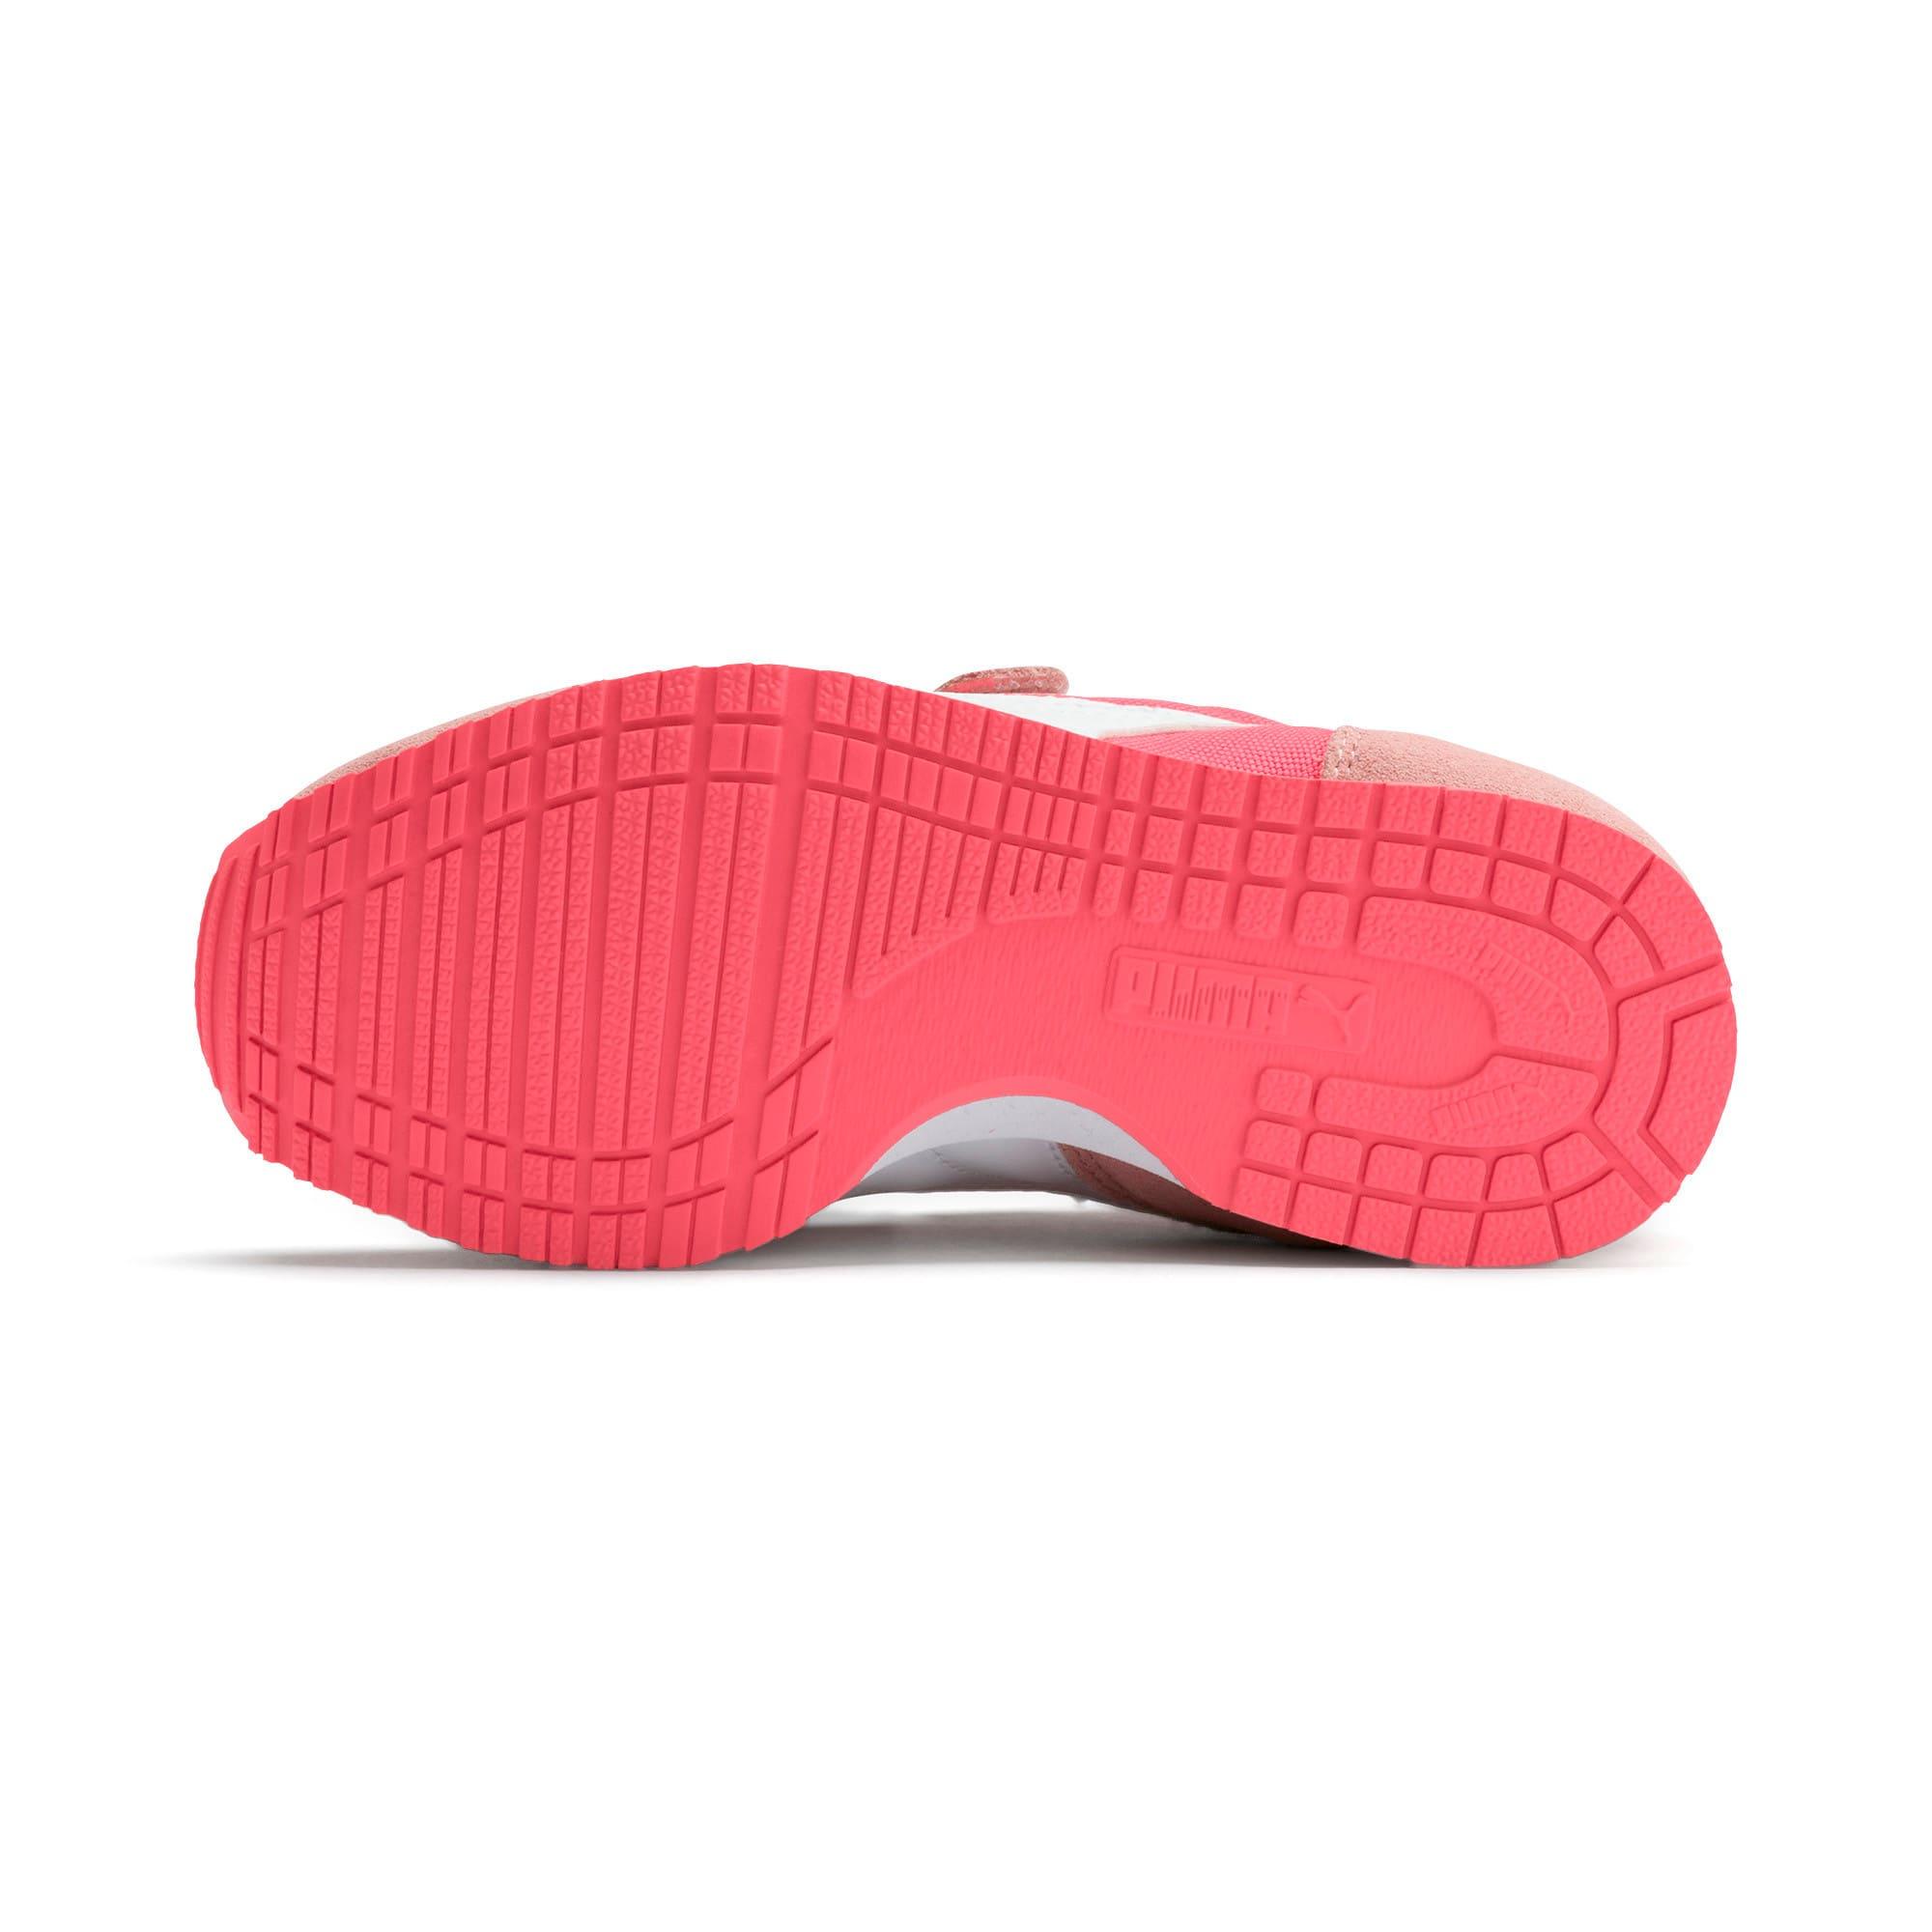 Miniatura 4 de Zapatos Cabana Racer para niño pequeño, Calypso Coral-Bridal Rose, mediano